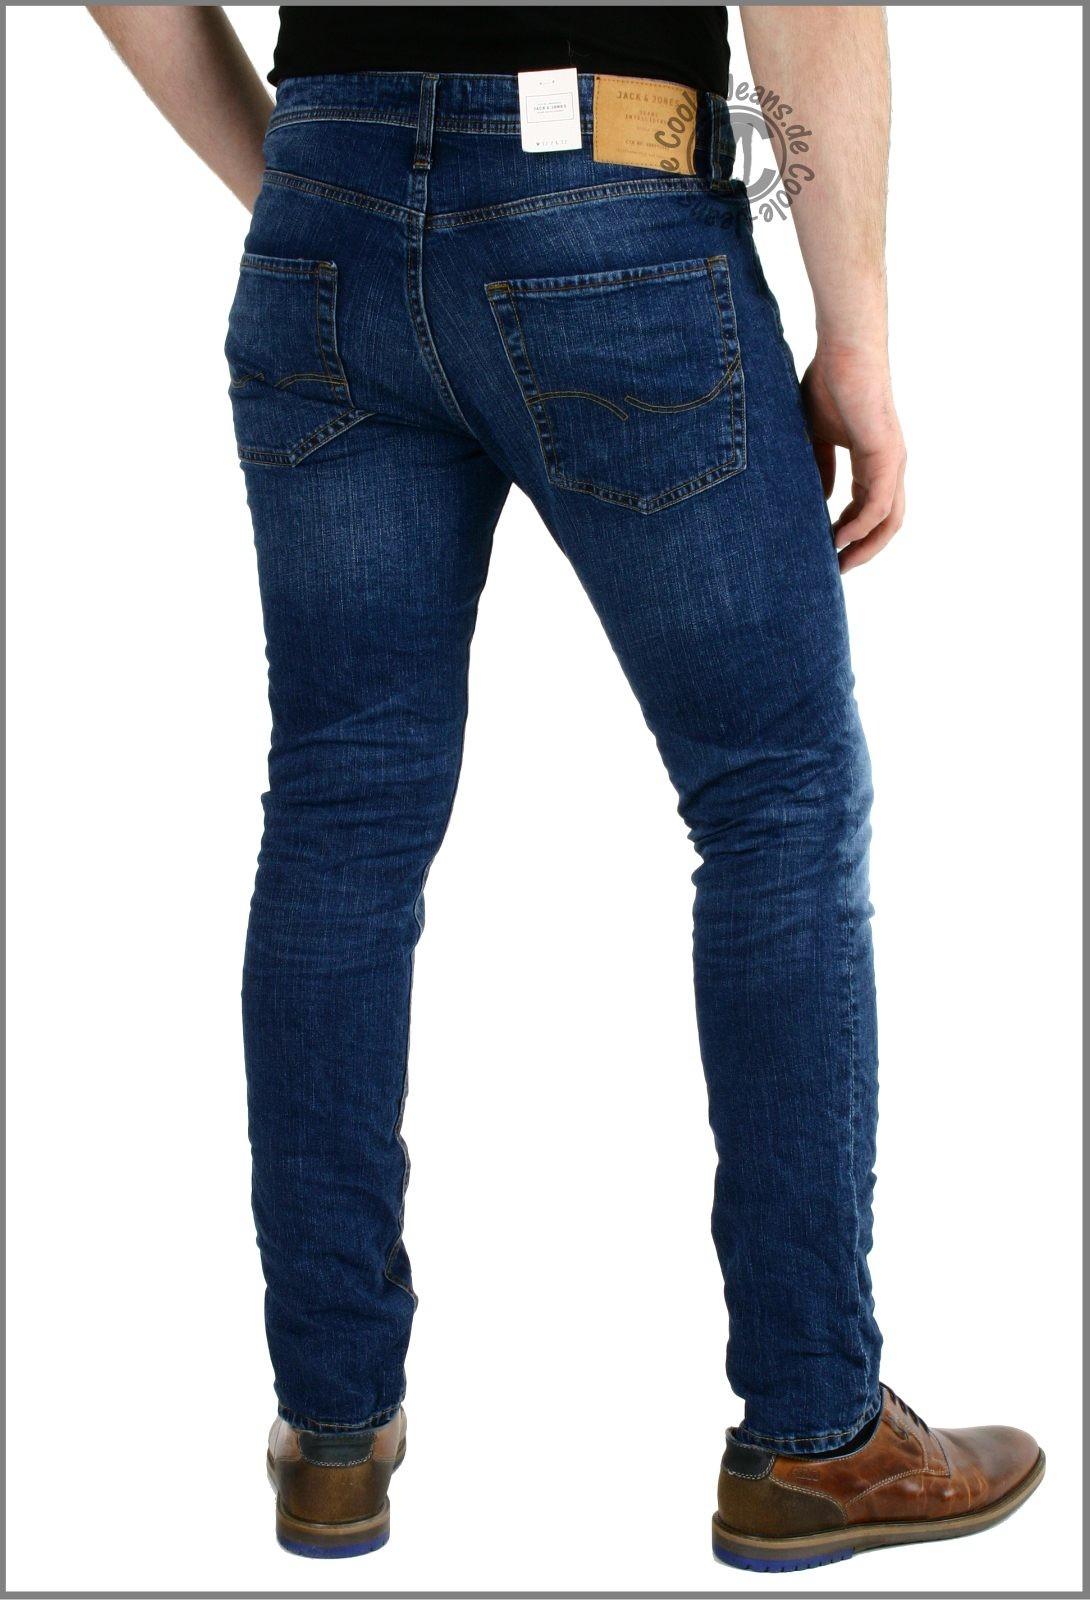 d1f0c638c0fad0 ... Jeans TIM von Jack and Jones